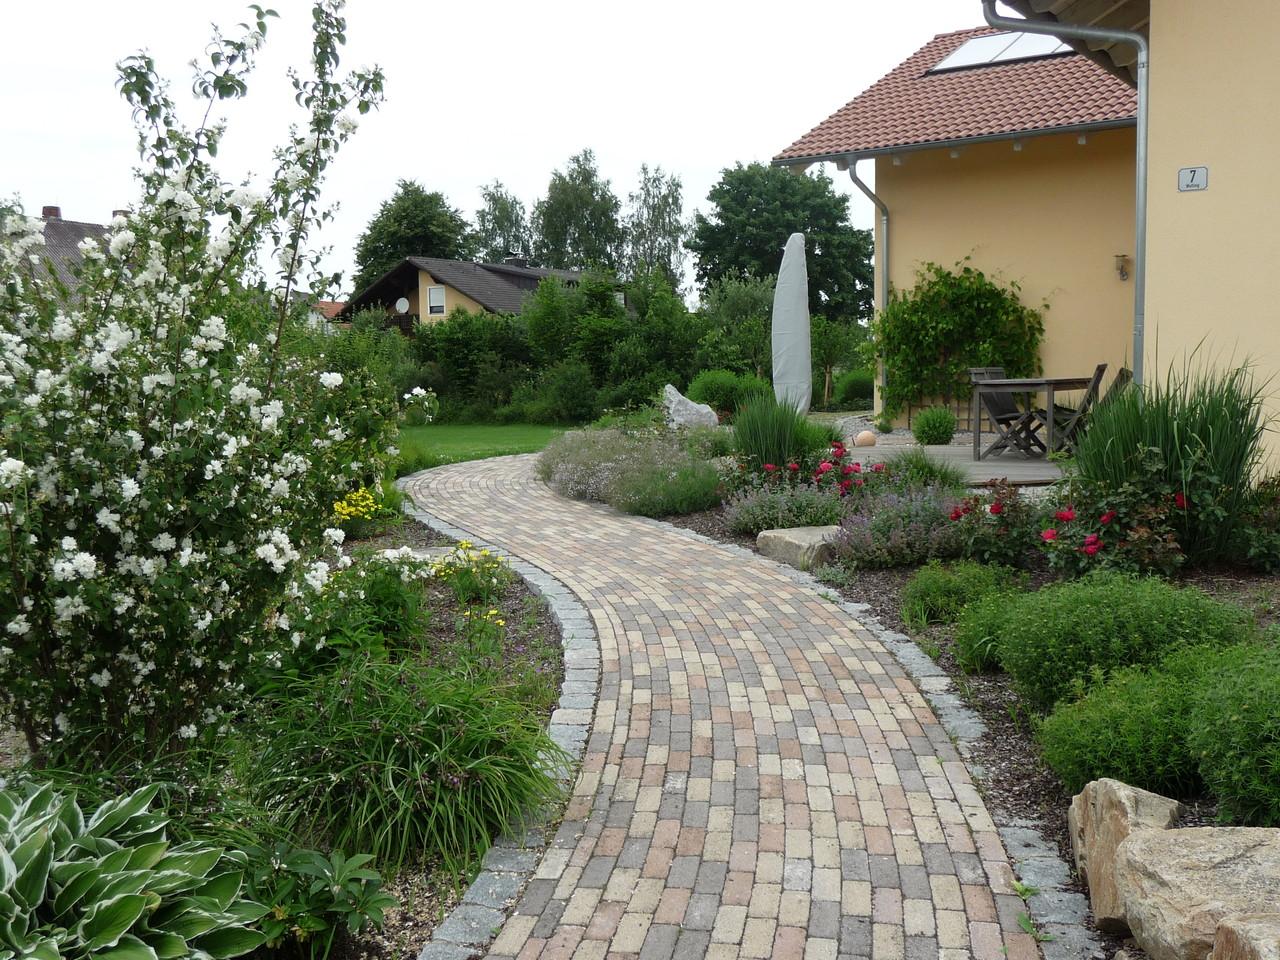 17310720180119 gartengestaltung nicolai regensburg for Gartengestaltung app